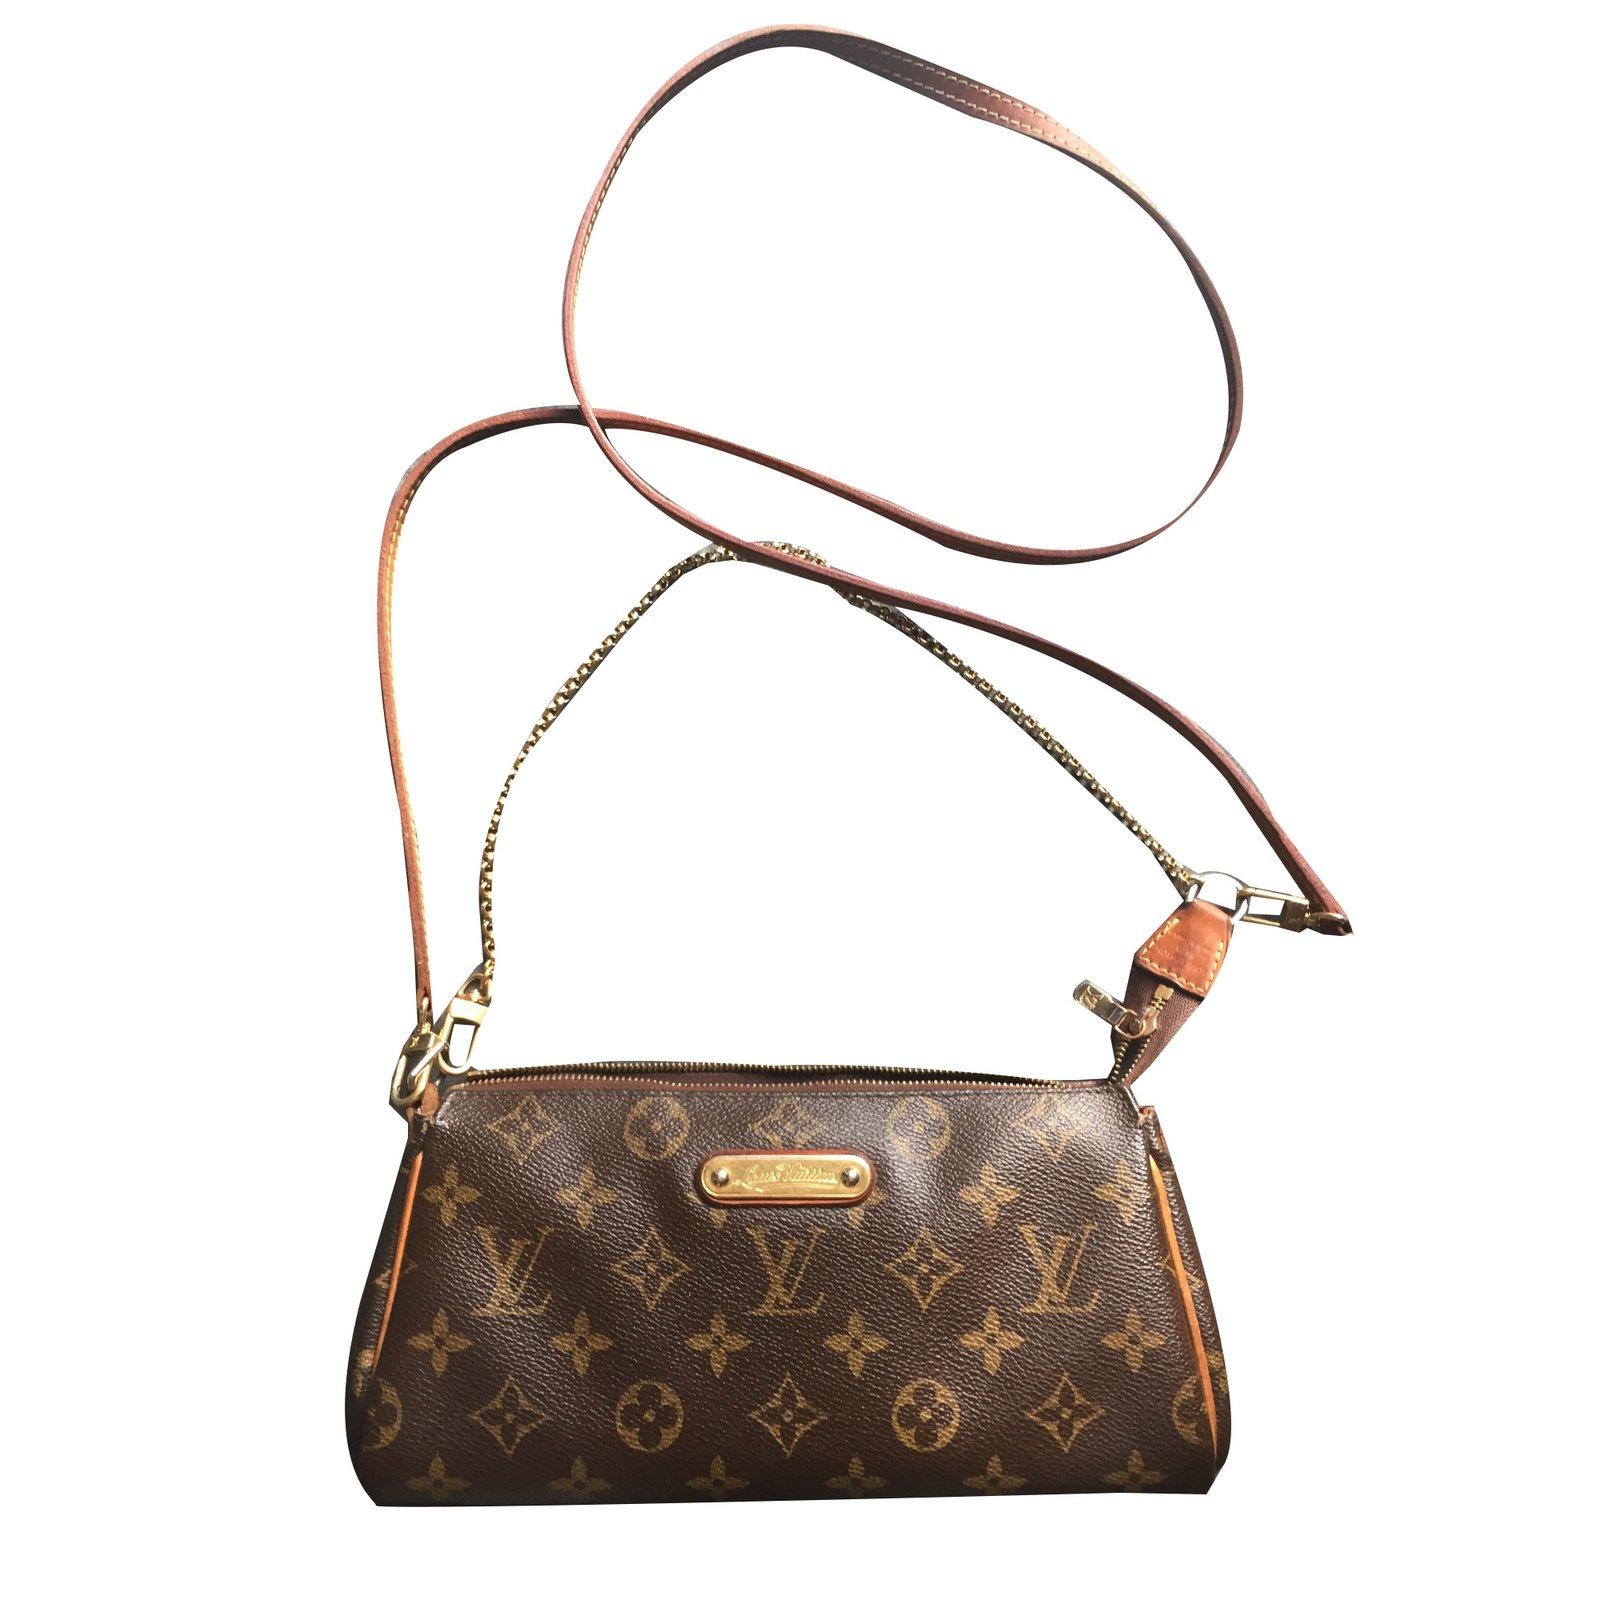 Louis Vuitton Eva Clutch Bags Cloth Brown Ref 78718 Joli Closet